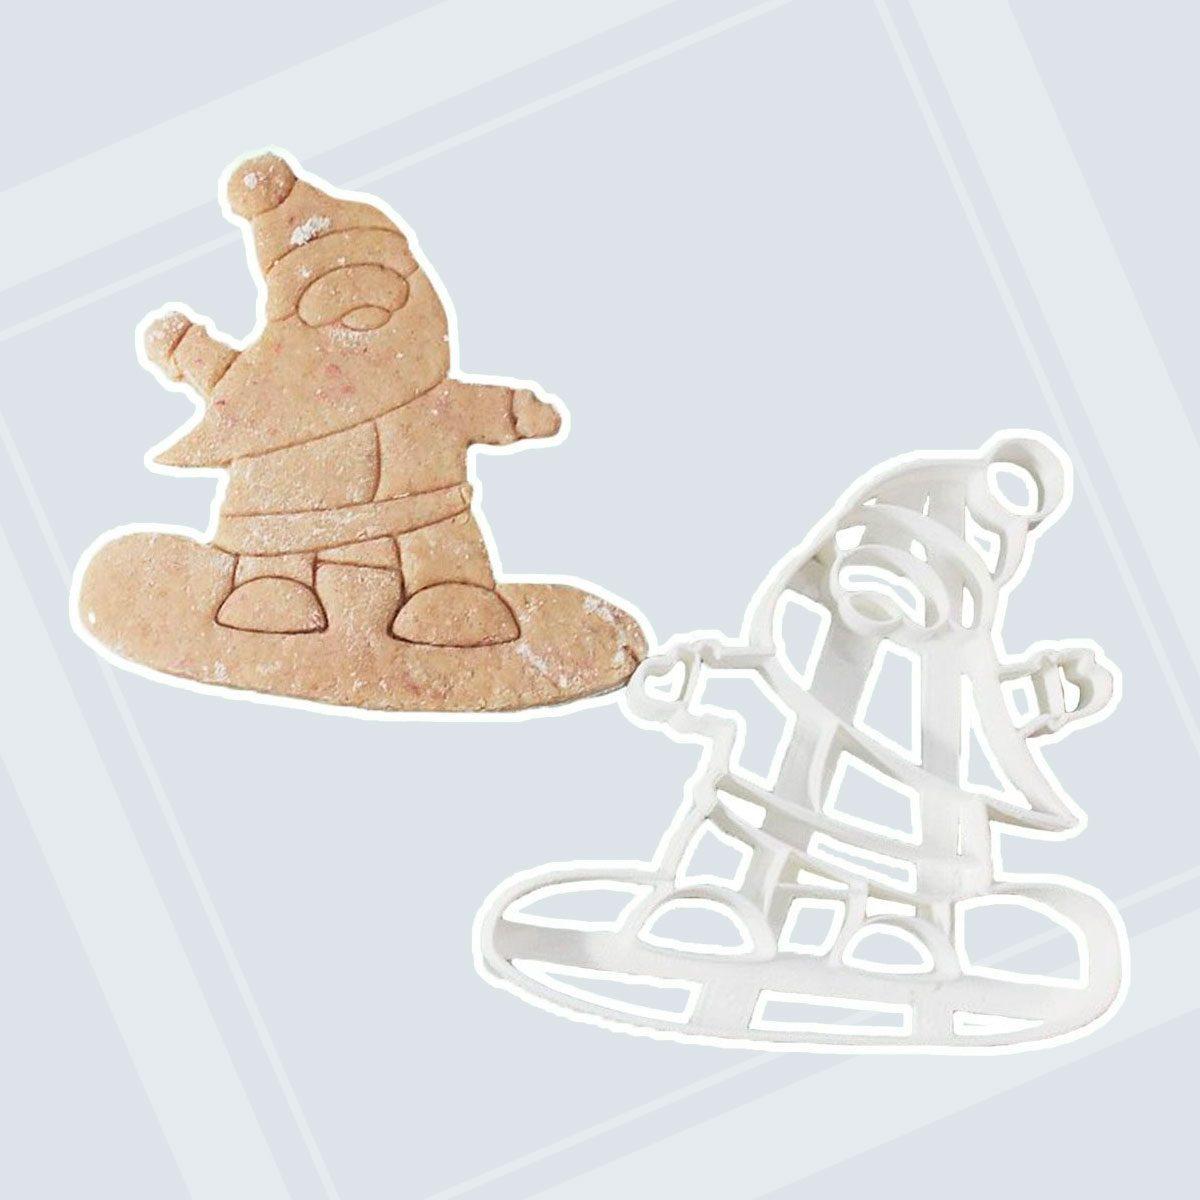 Santa Claus on Snowboard Cookie Cutter